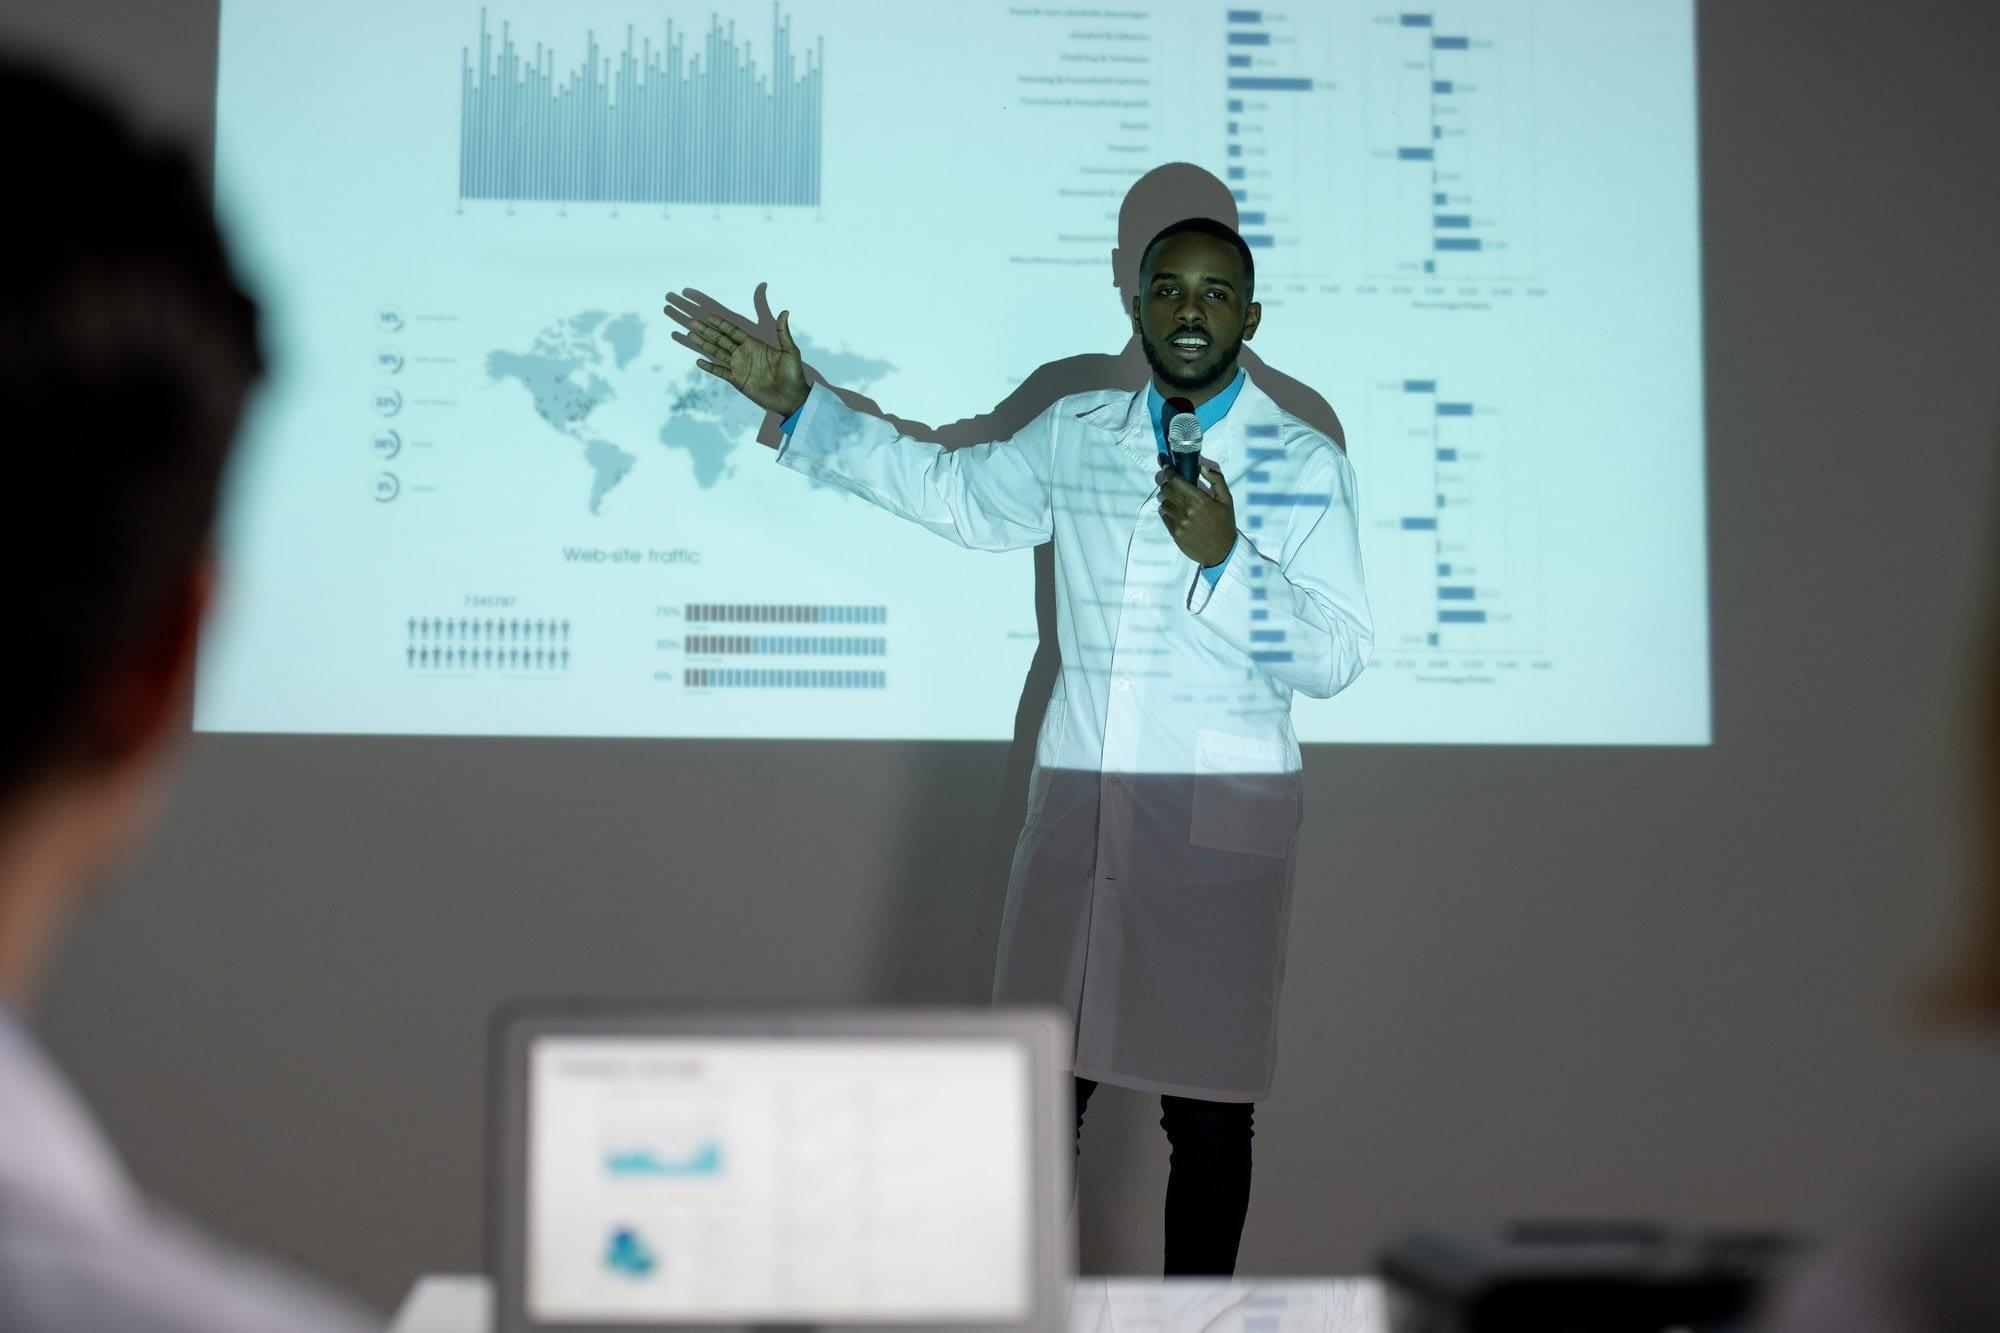 Showing statistics on spread of coronavirus